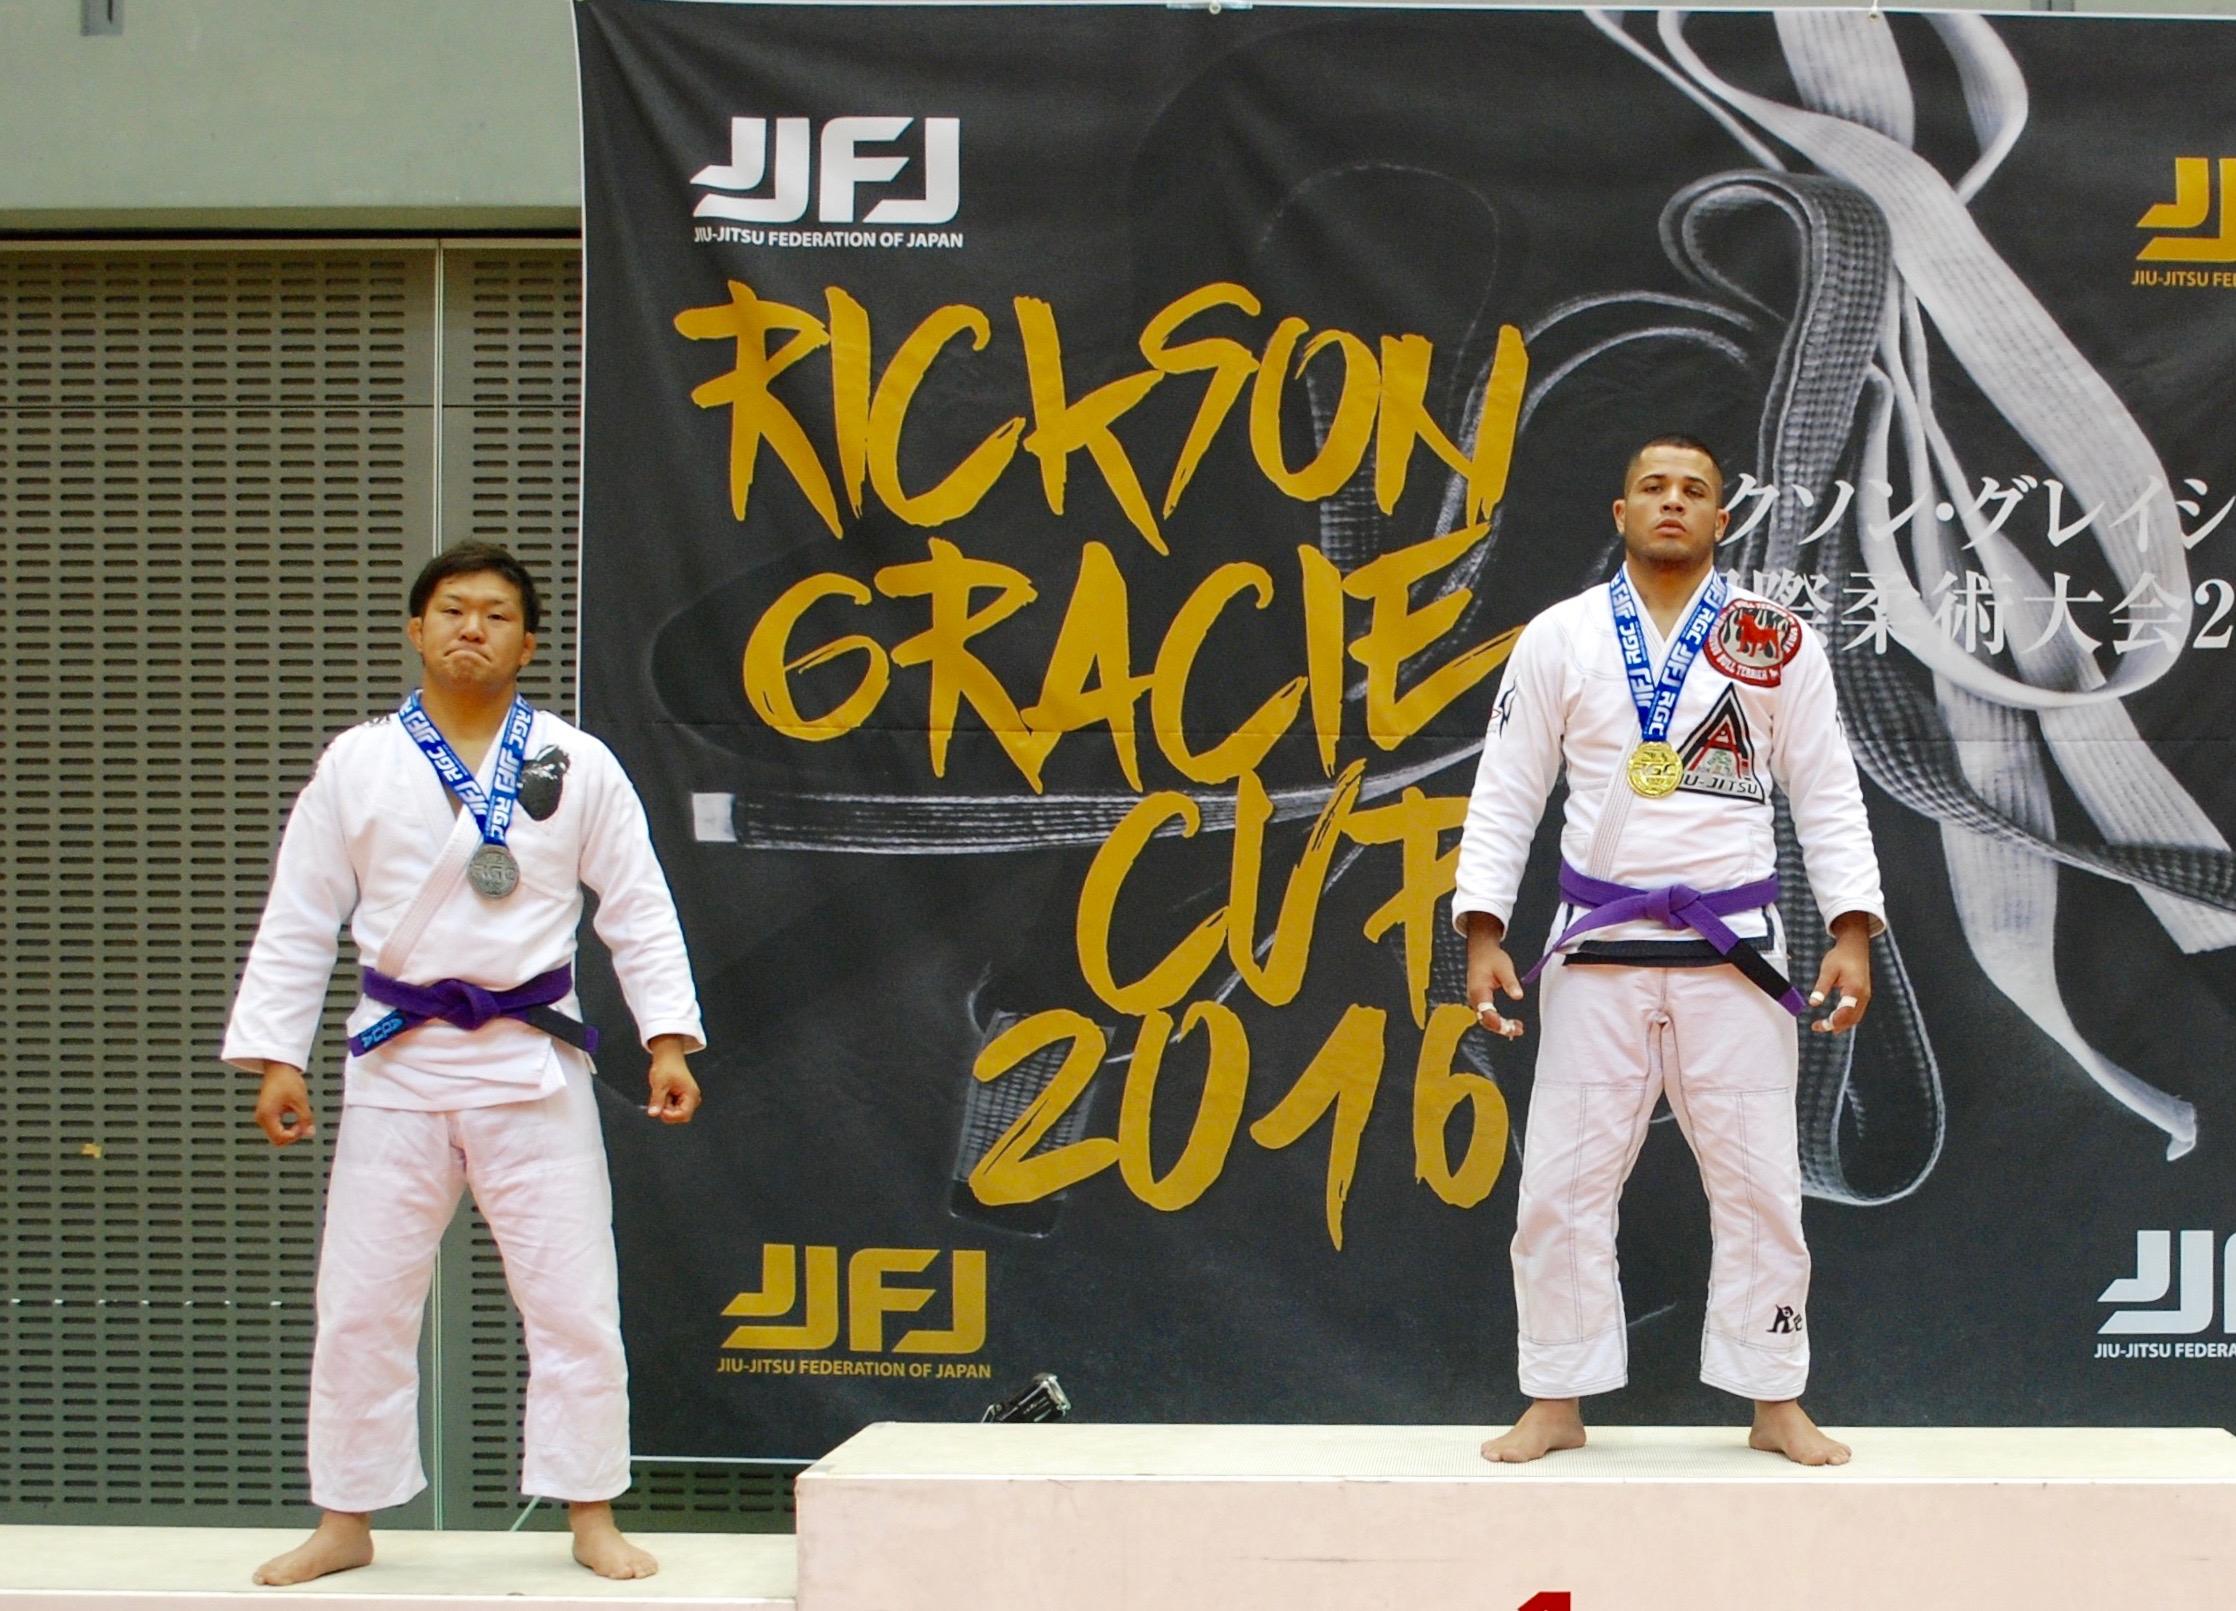 Jjfj ÁŠçŸ¥ã'‰ã› Rickson Cup 2016 Purple Belt Results